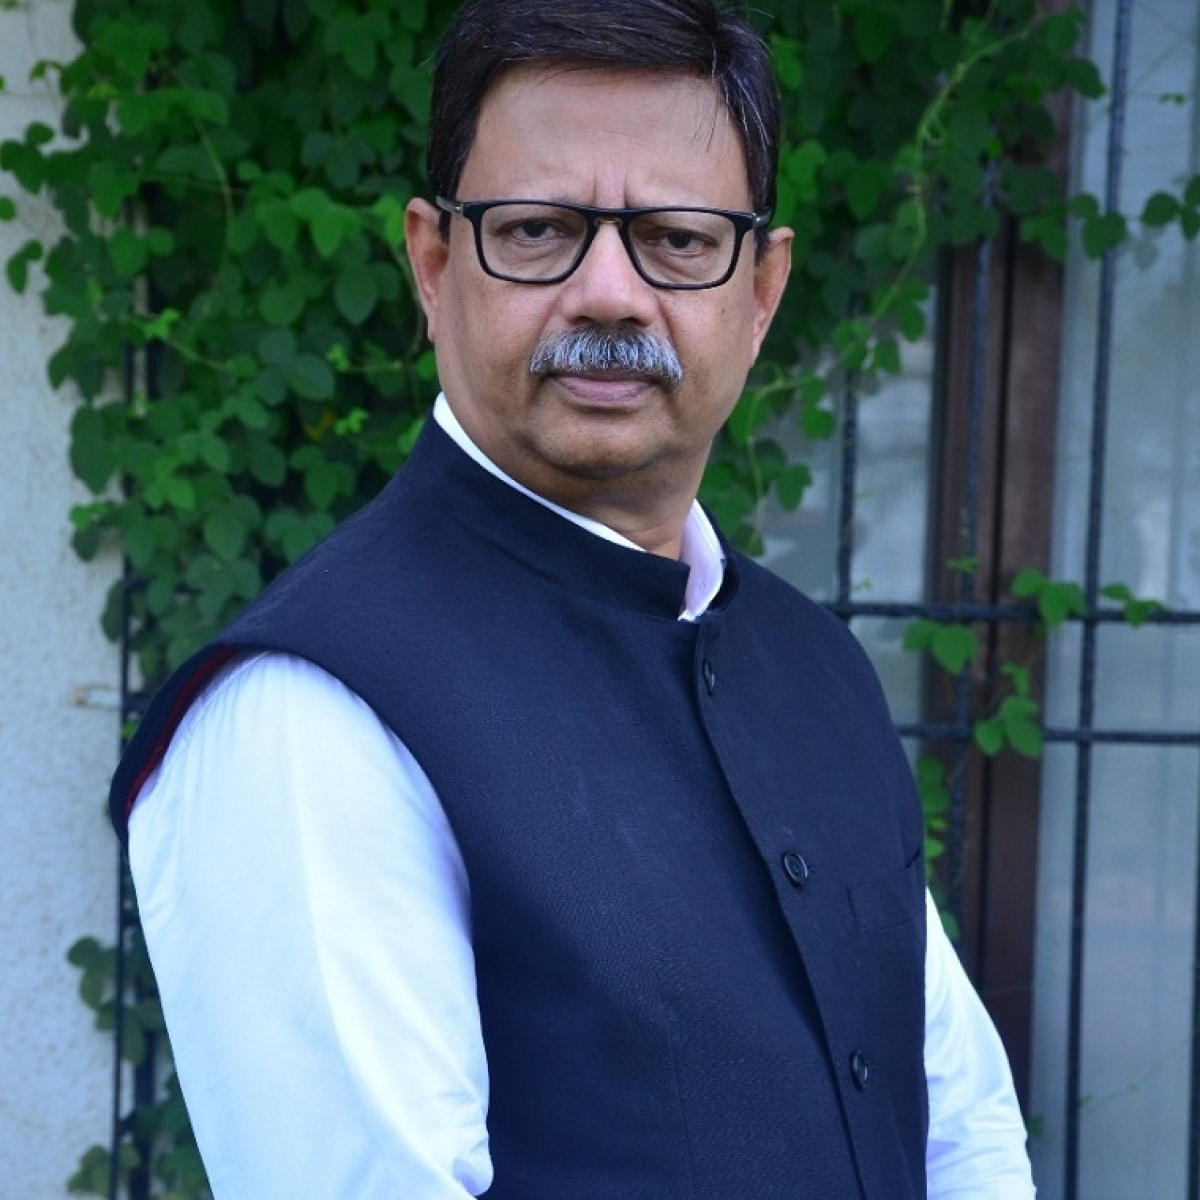 Atmanirbhar Bharat: MMRDA is a pioneer in Make in India, Atmanirbhar Bharat movement